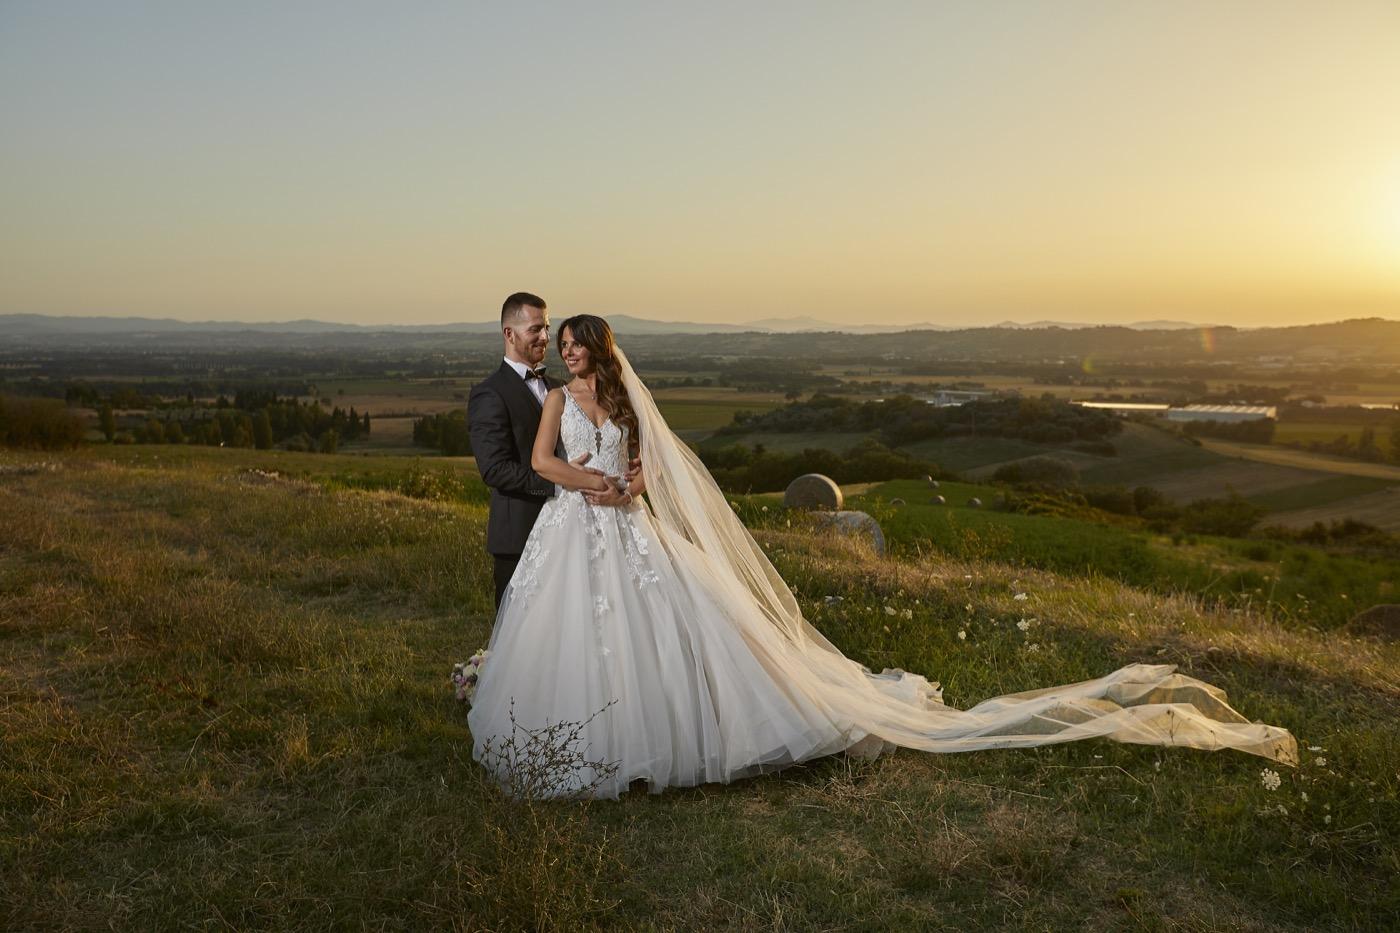 Claudio-Coppola-wedding-photographer-la-scuderia-eventi-preparativi-la-rosetta-perugia-77